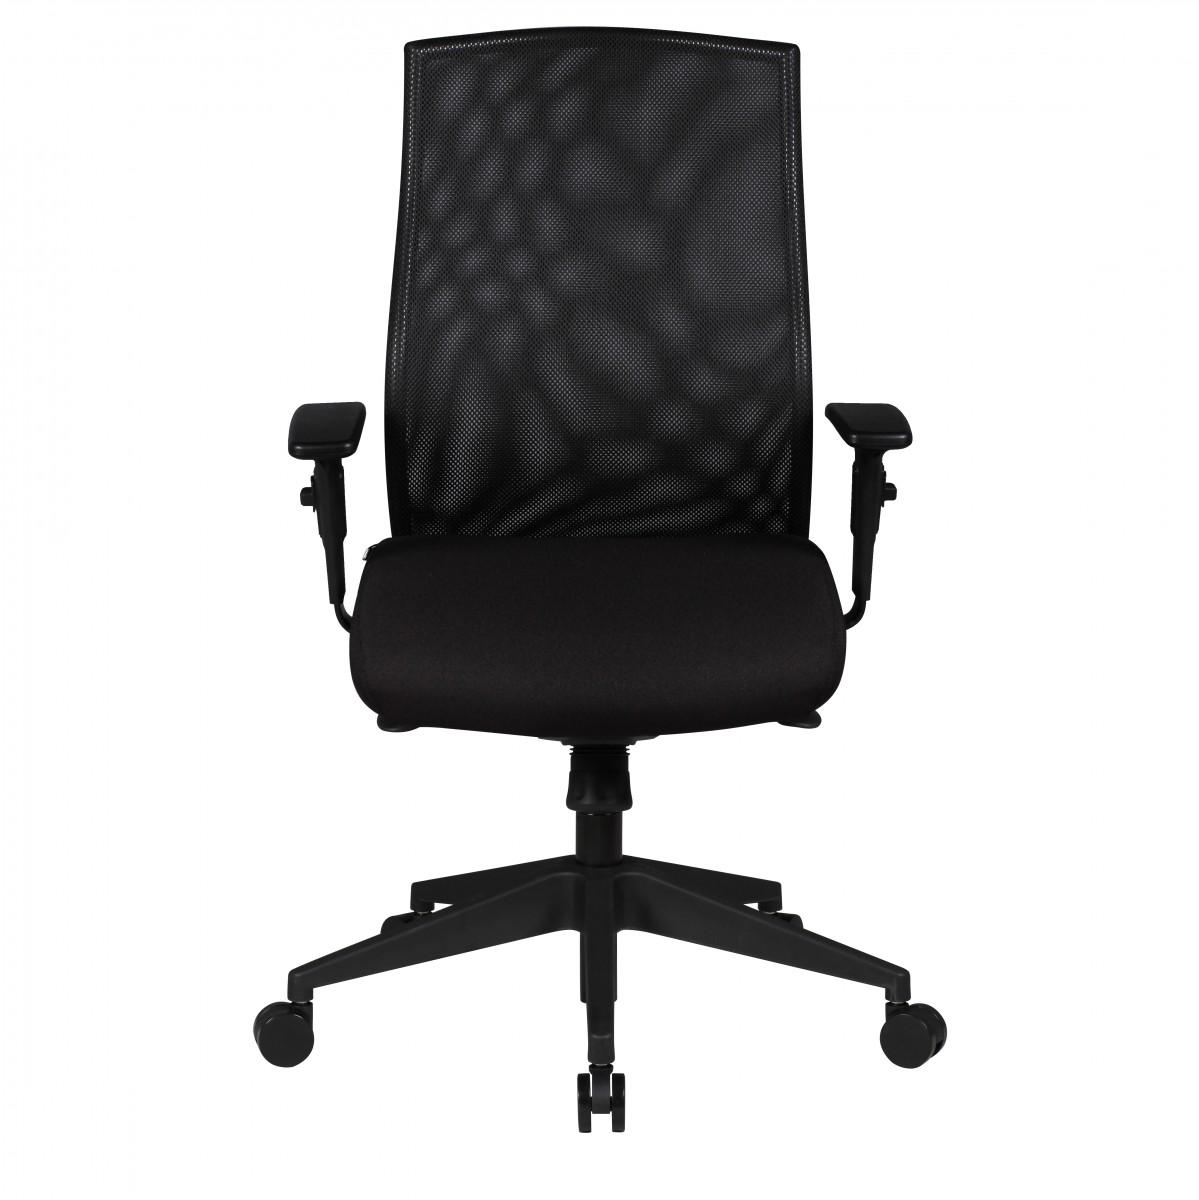 Bürostuhl David Stoffbezug schwarz Drehstuhl mit 3-Punkt Synchronmechanik